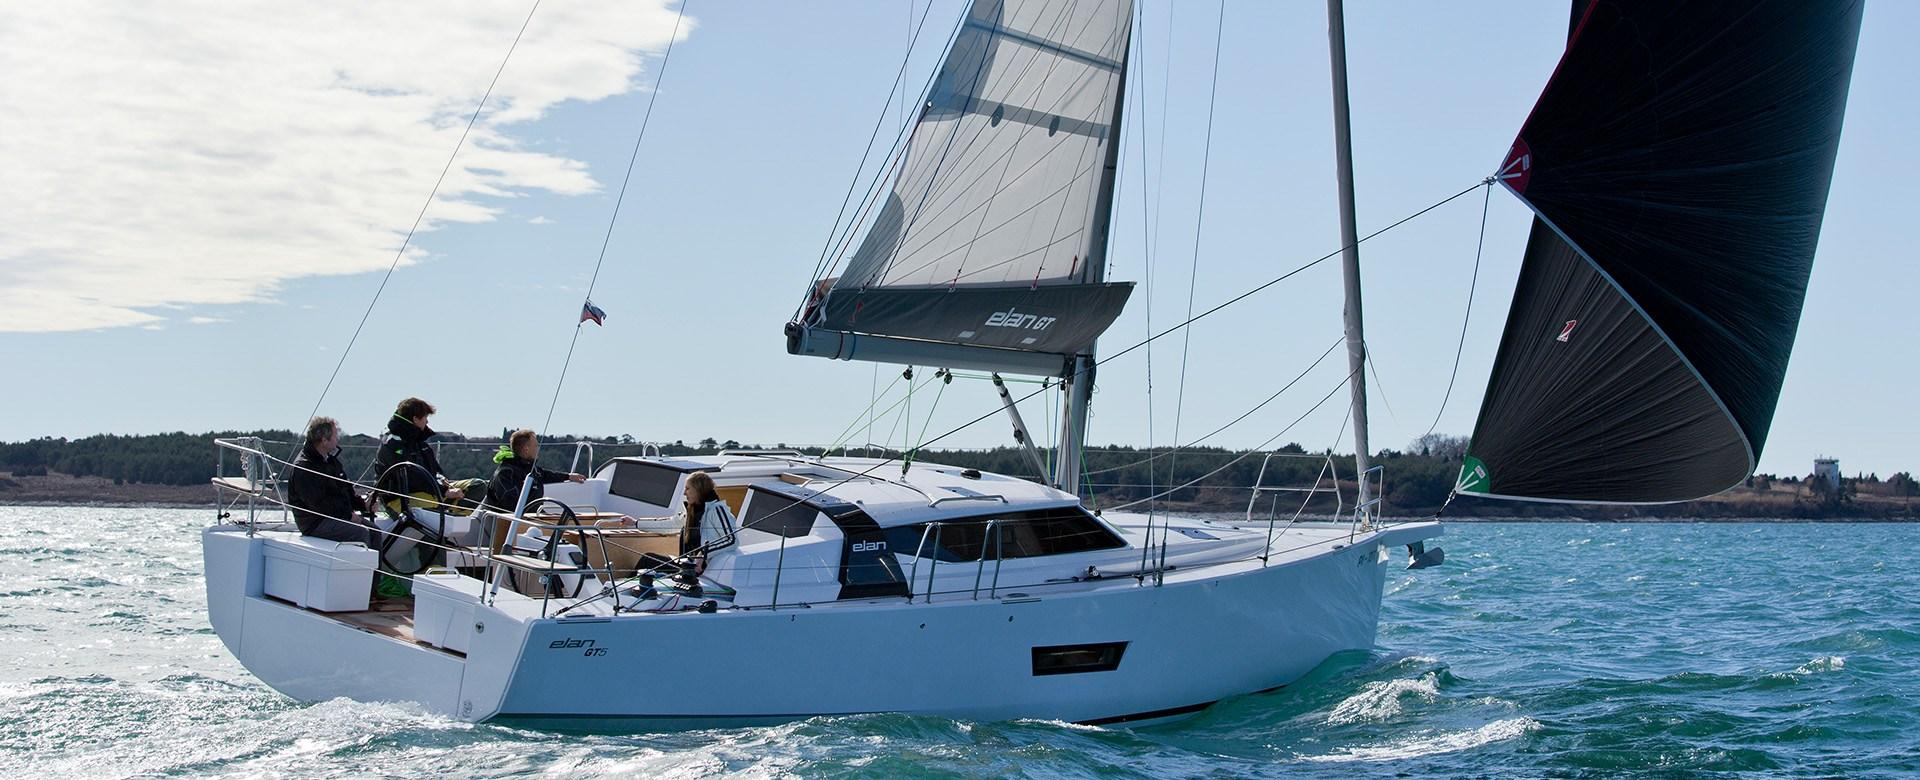 California_Yacht_Imports-slider-elangt5-luxury-boat1